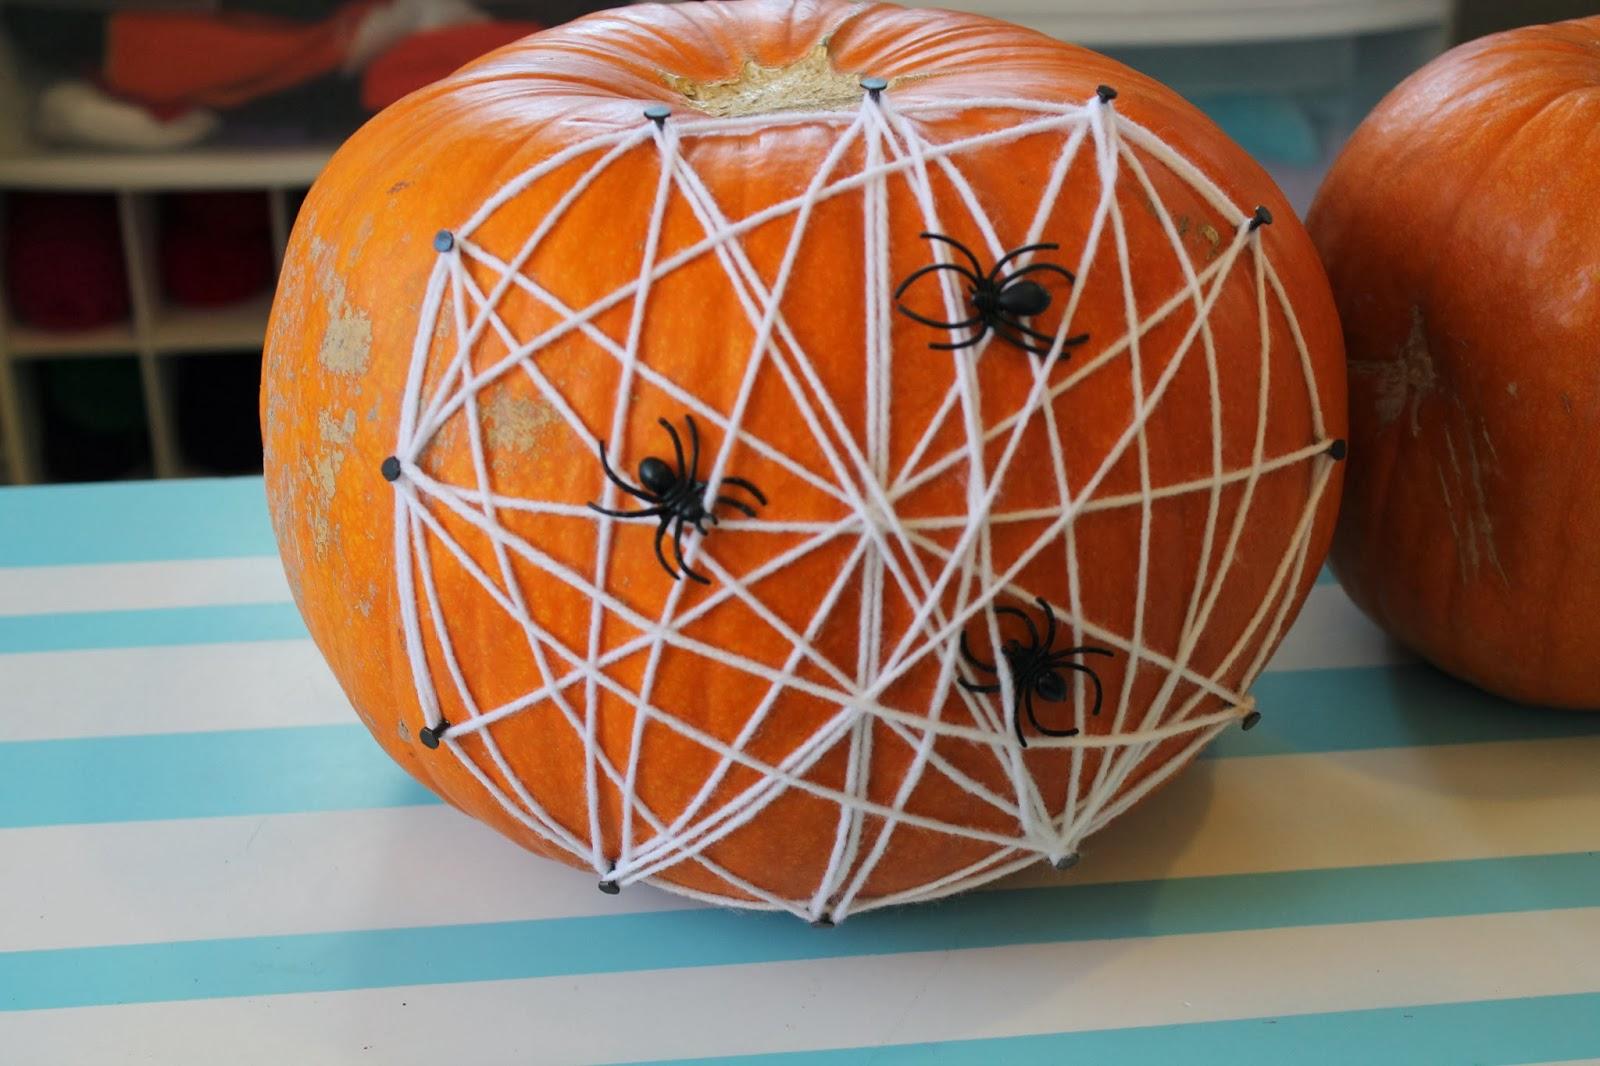 & No Carve Pumpkin Ideas - Find it Make it Love it